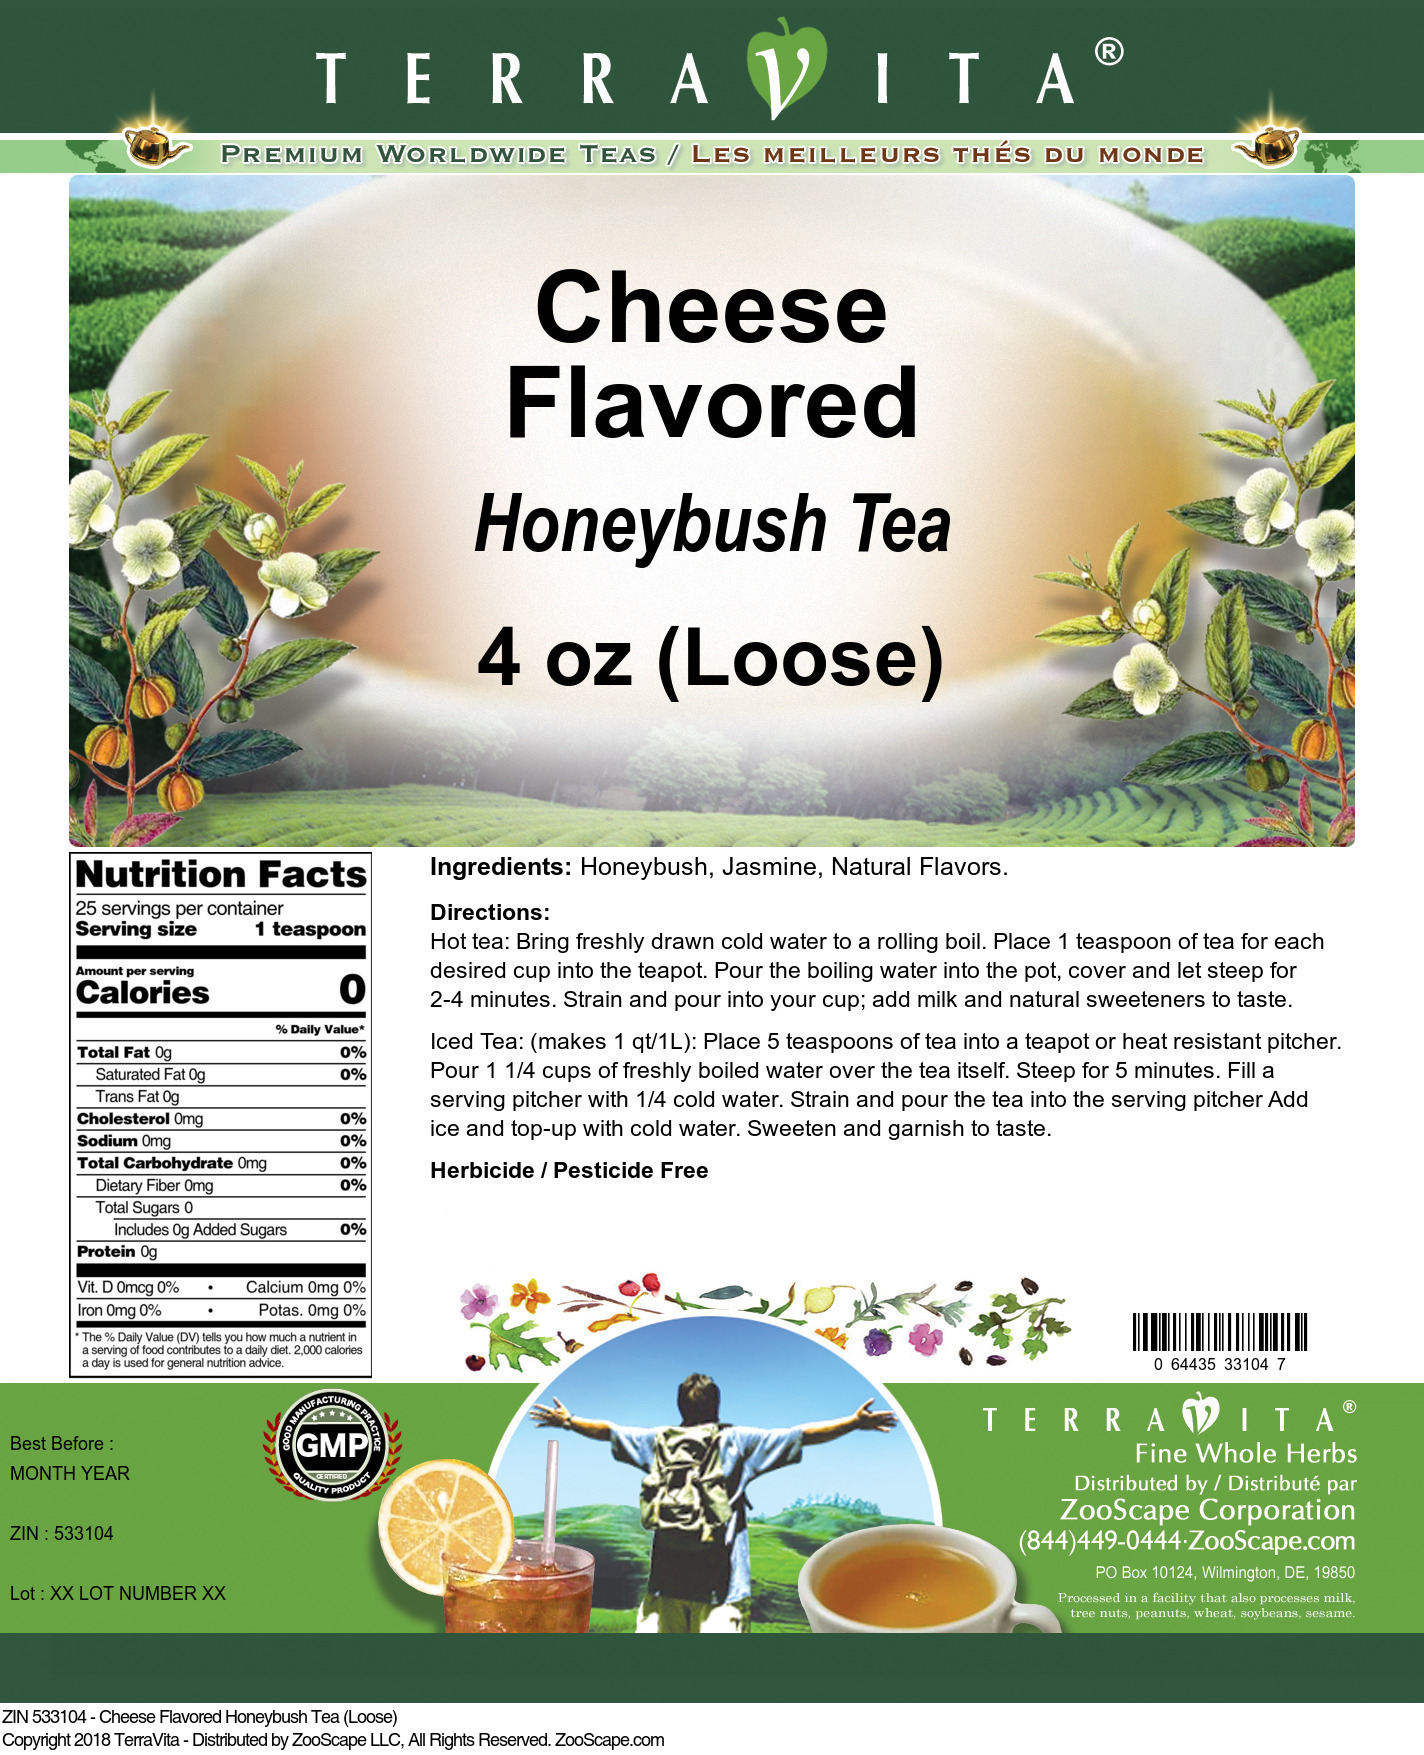 Cheese Flavored Honeybush Tea (Loose)